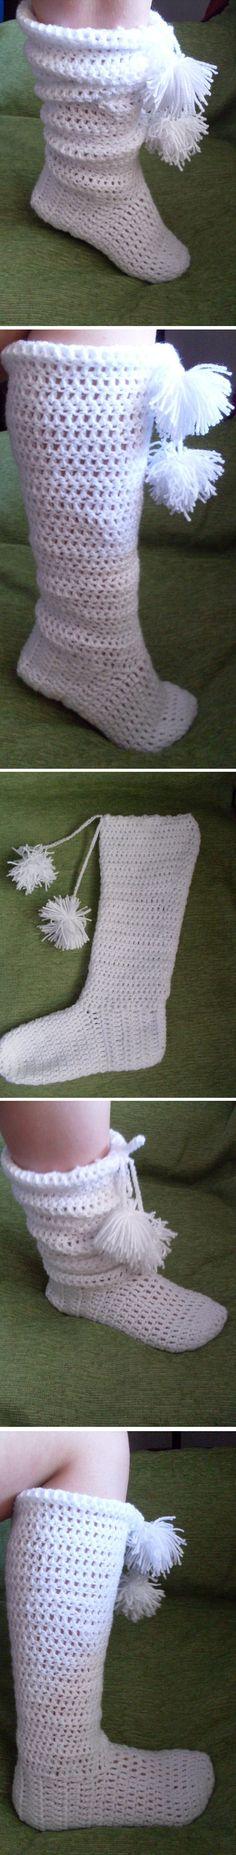 Slipper Boots to crochet - *Inspiration*